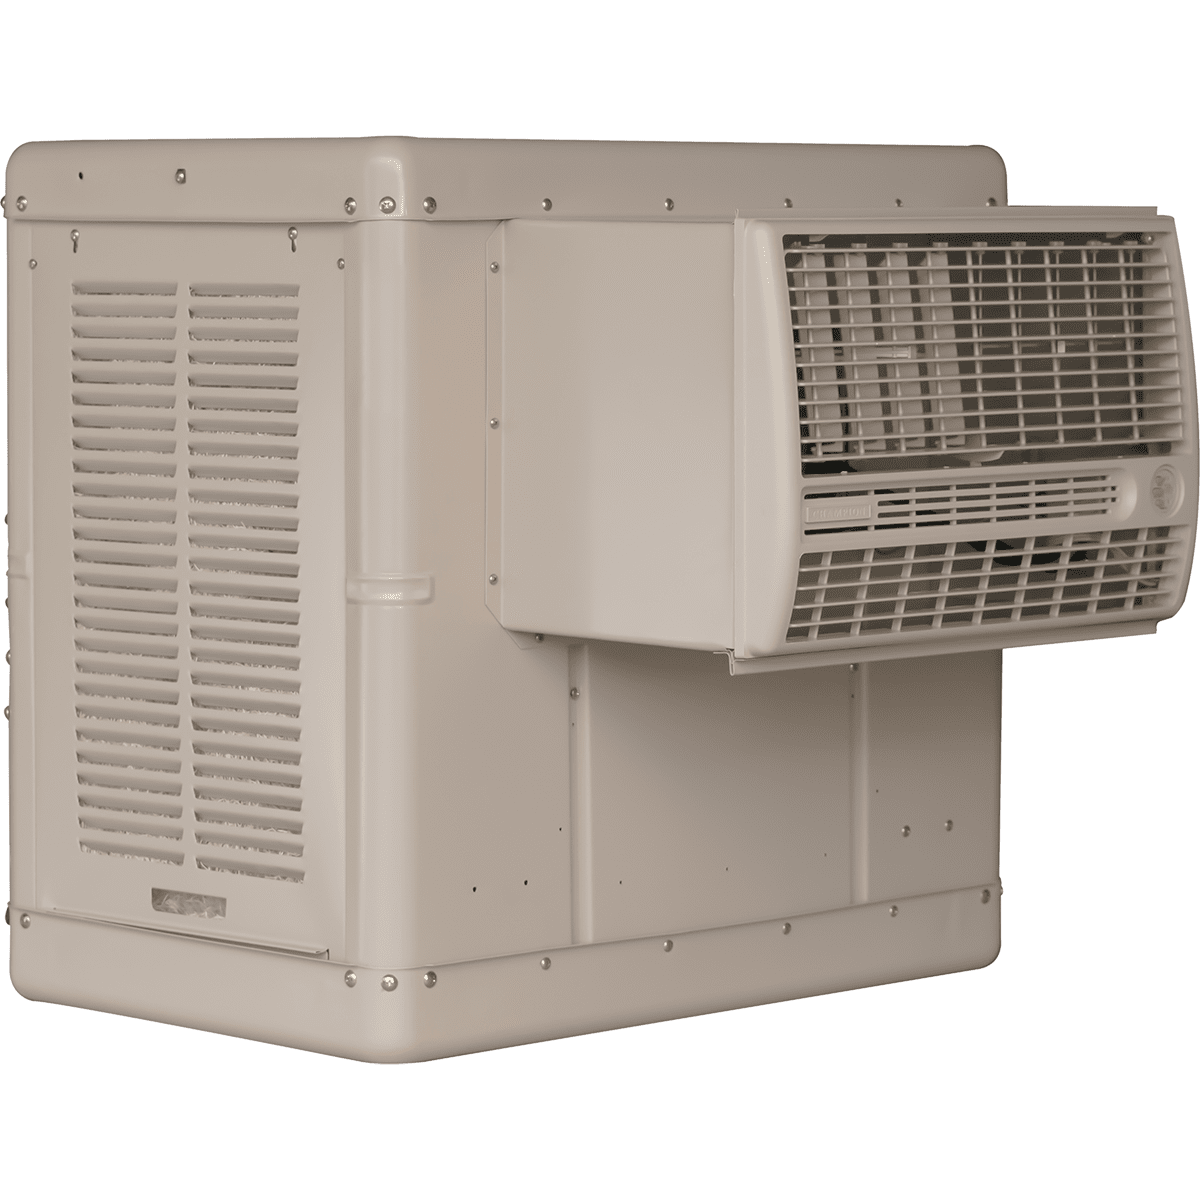 Essick Air RN35W Window Evaporative Cooler